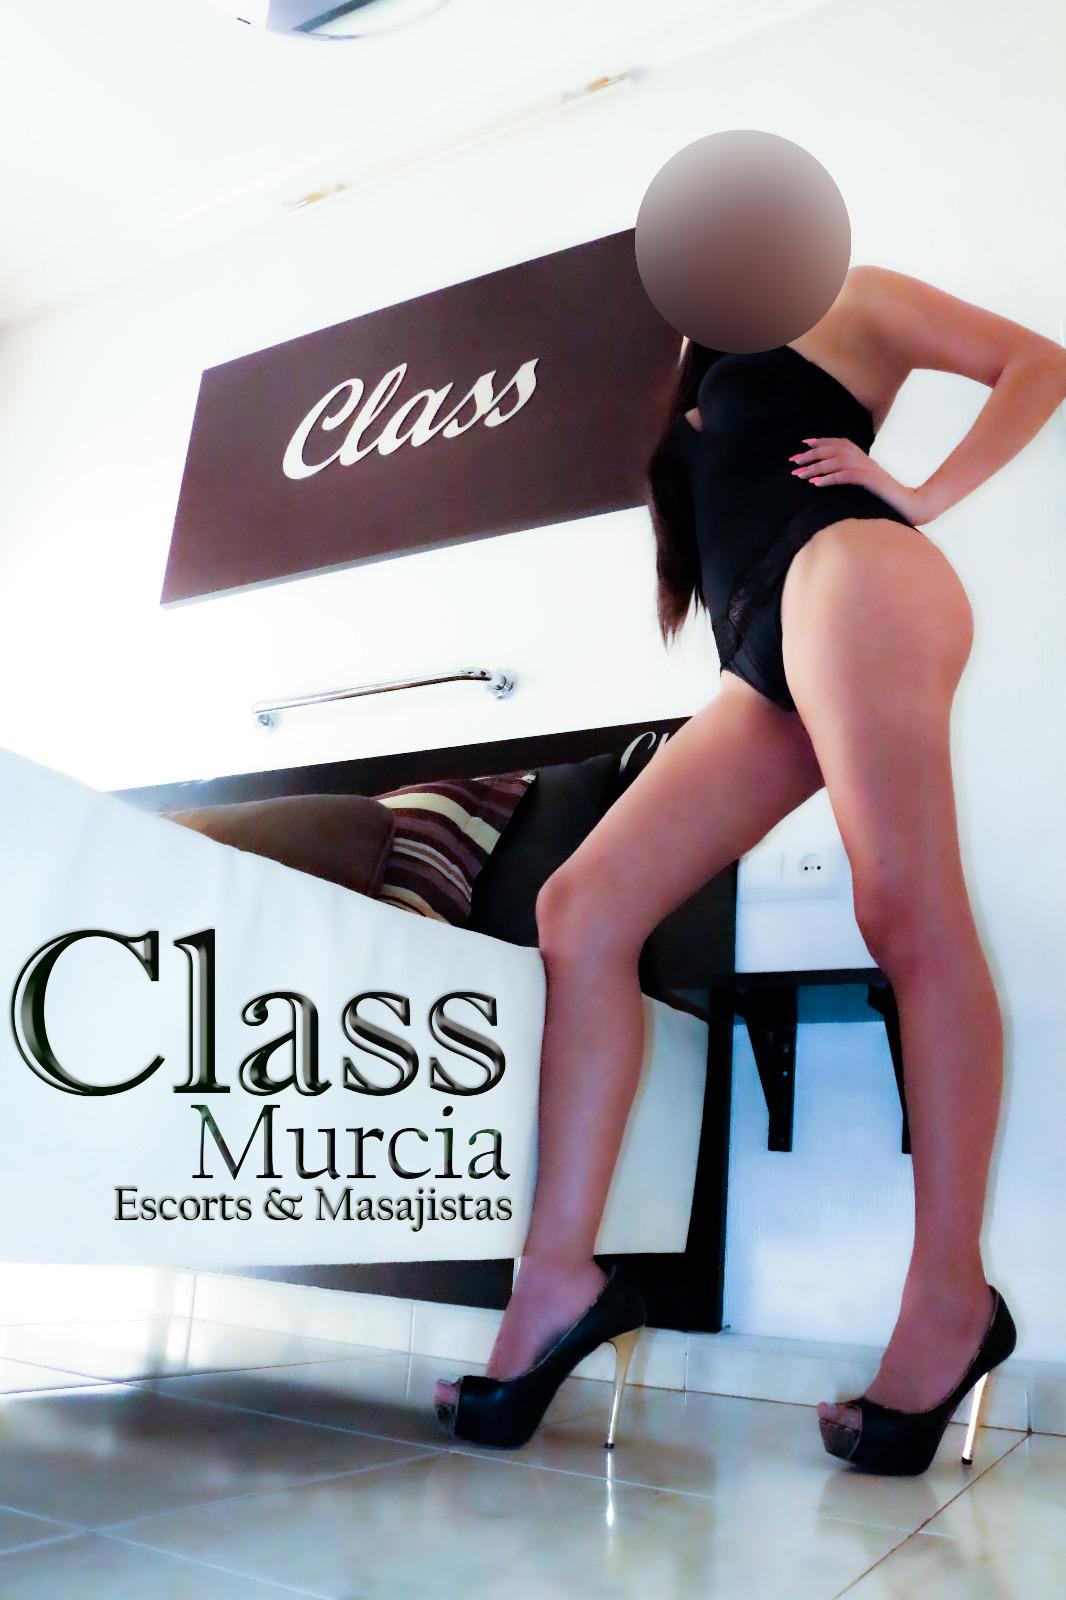 escorts murcia y putas murcia - 655655564